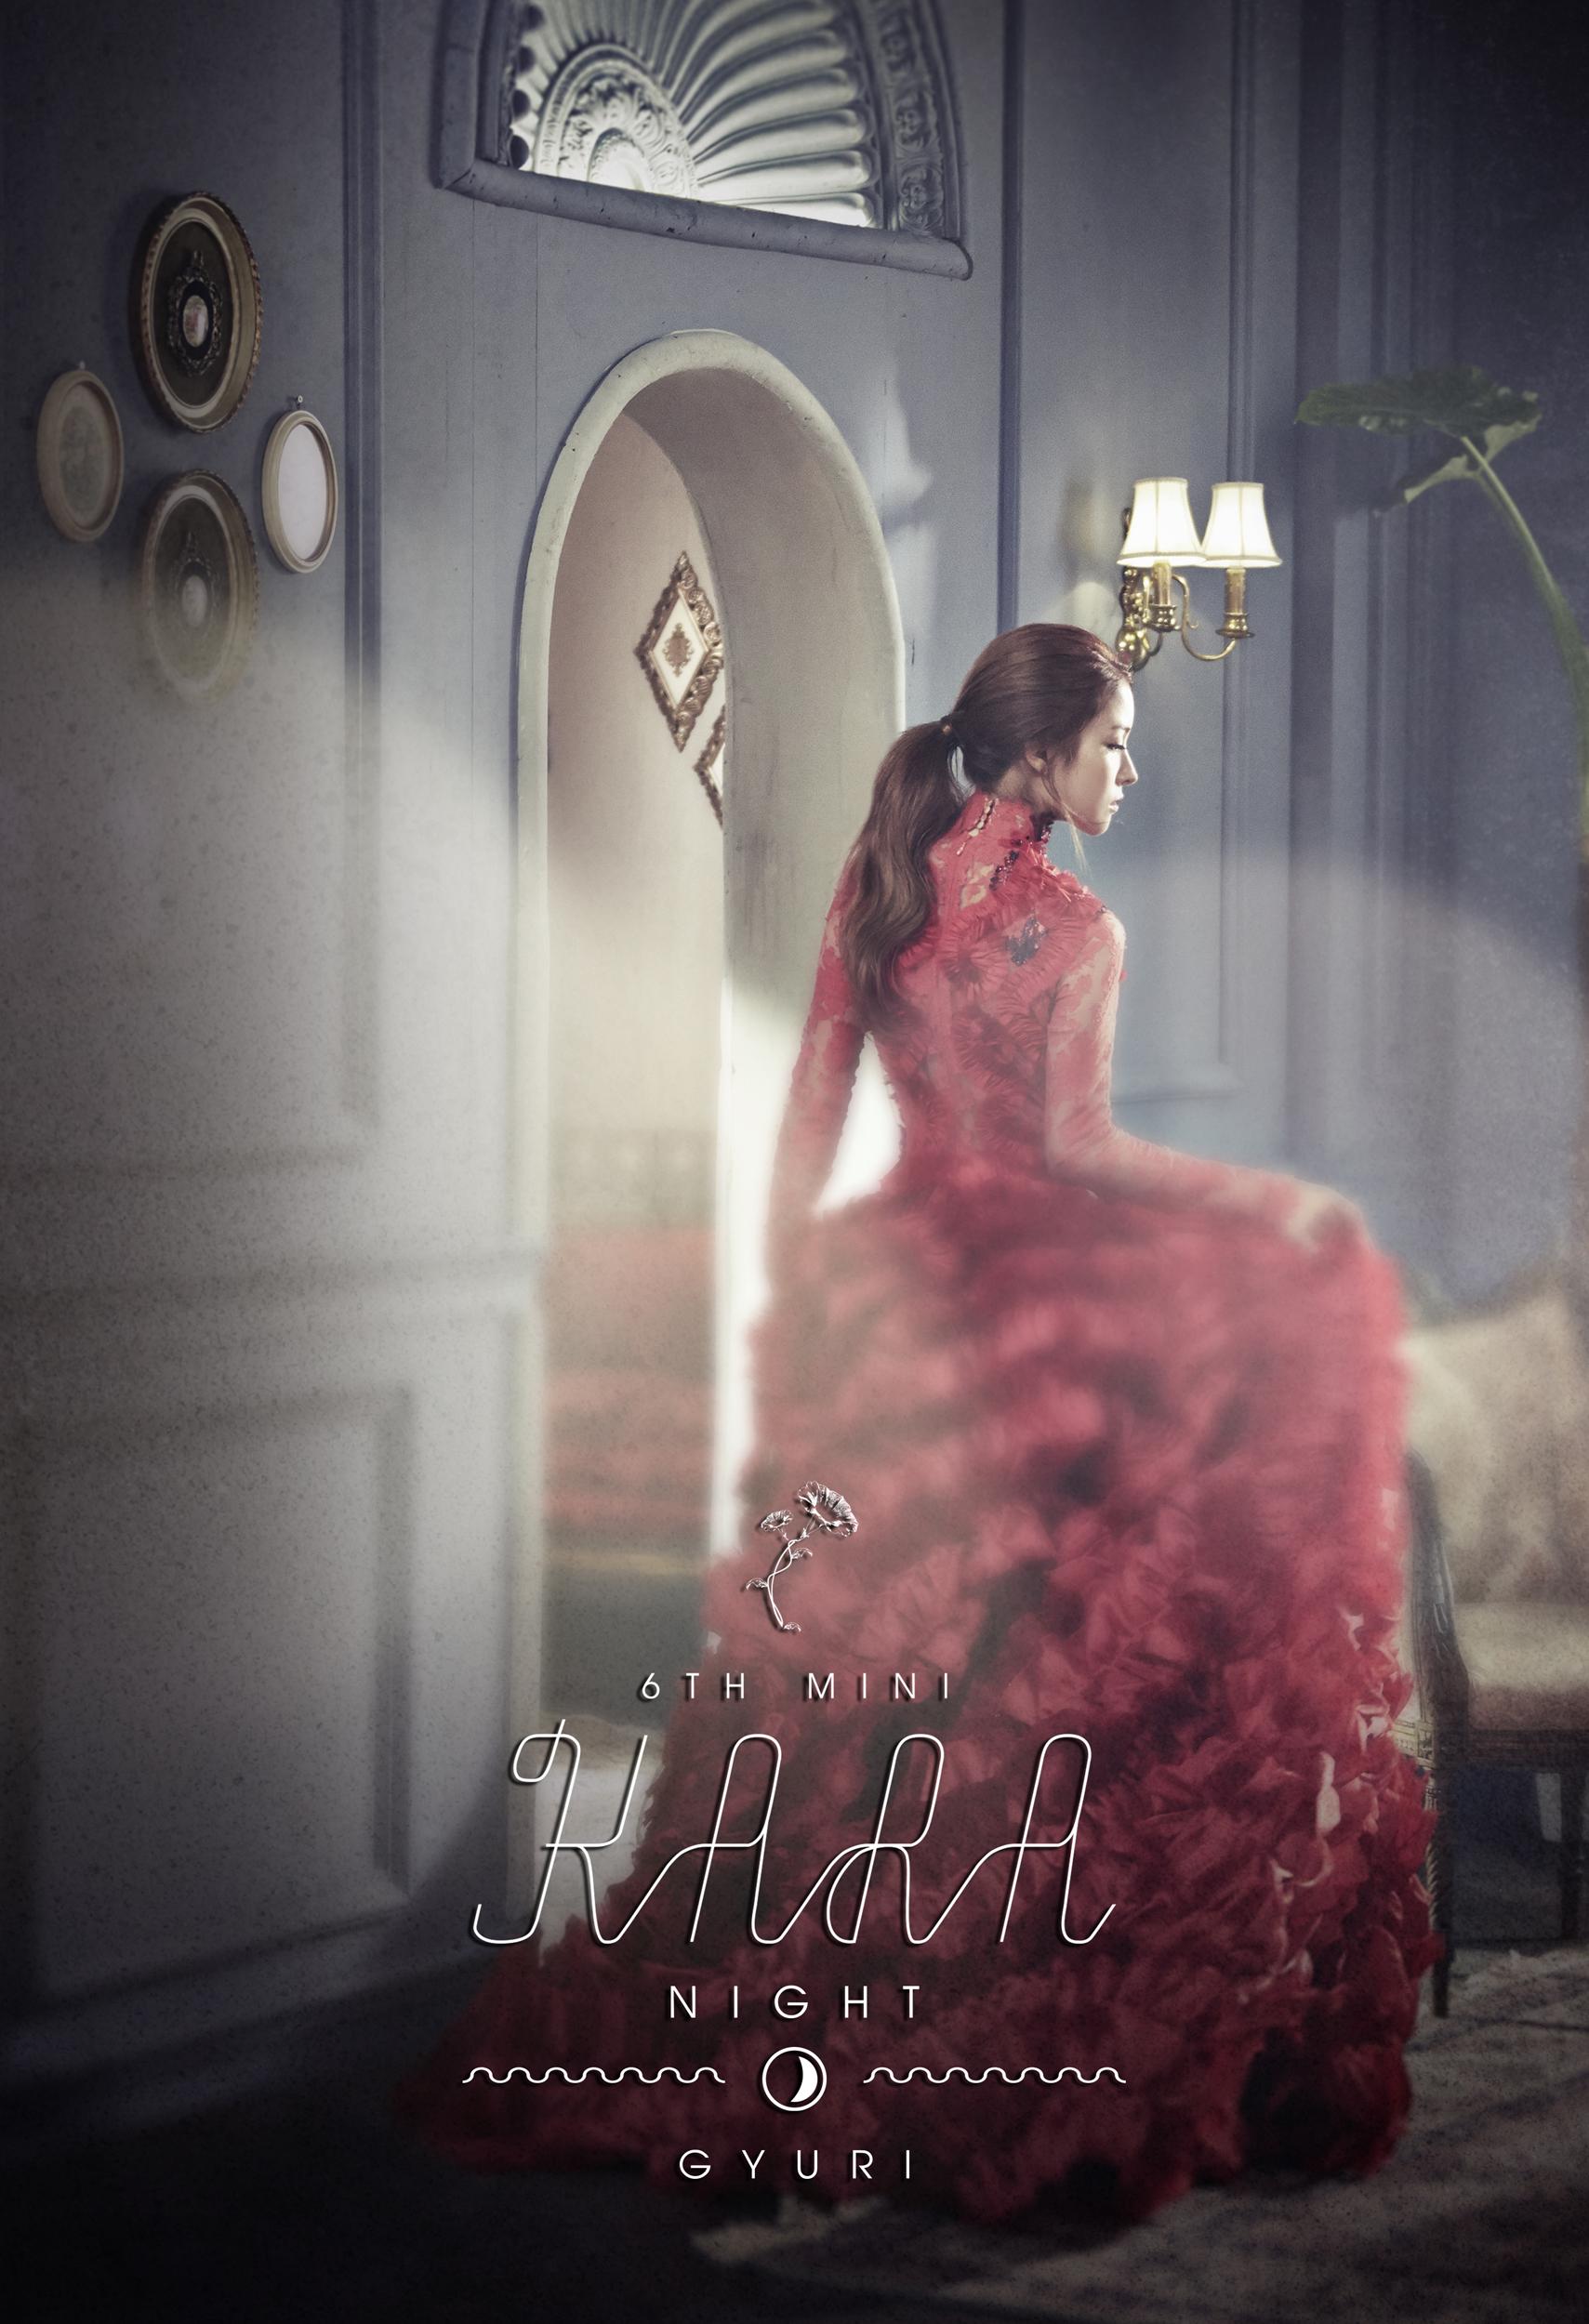 KARA Gyuri 'Day & Night' Teaser 2 HQ